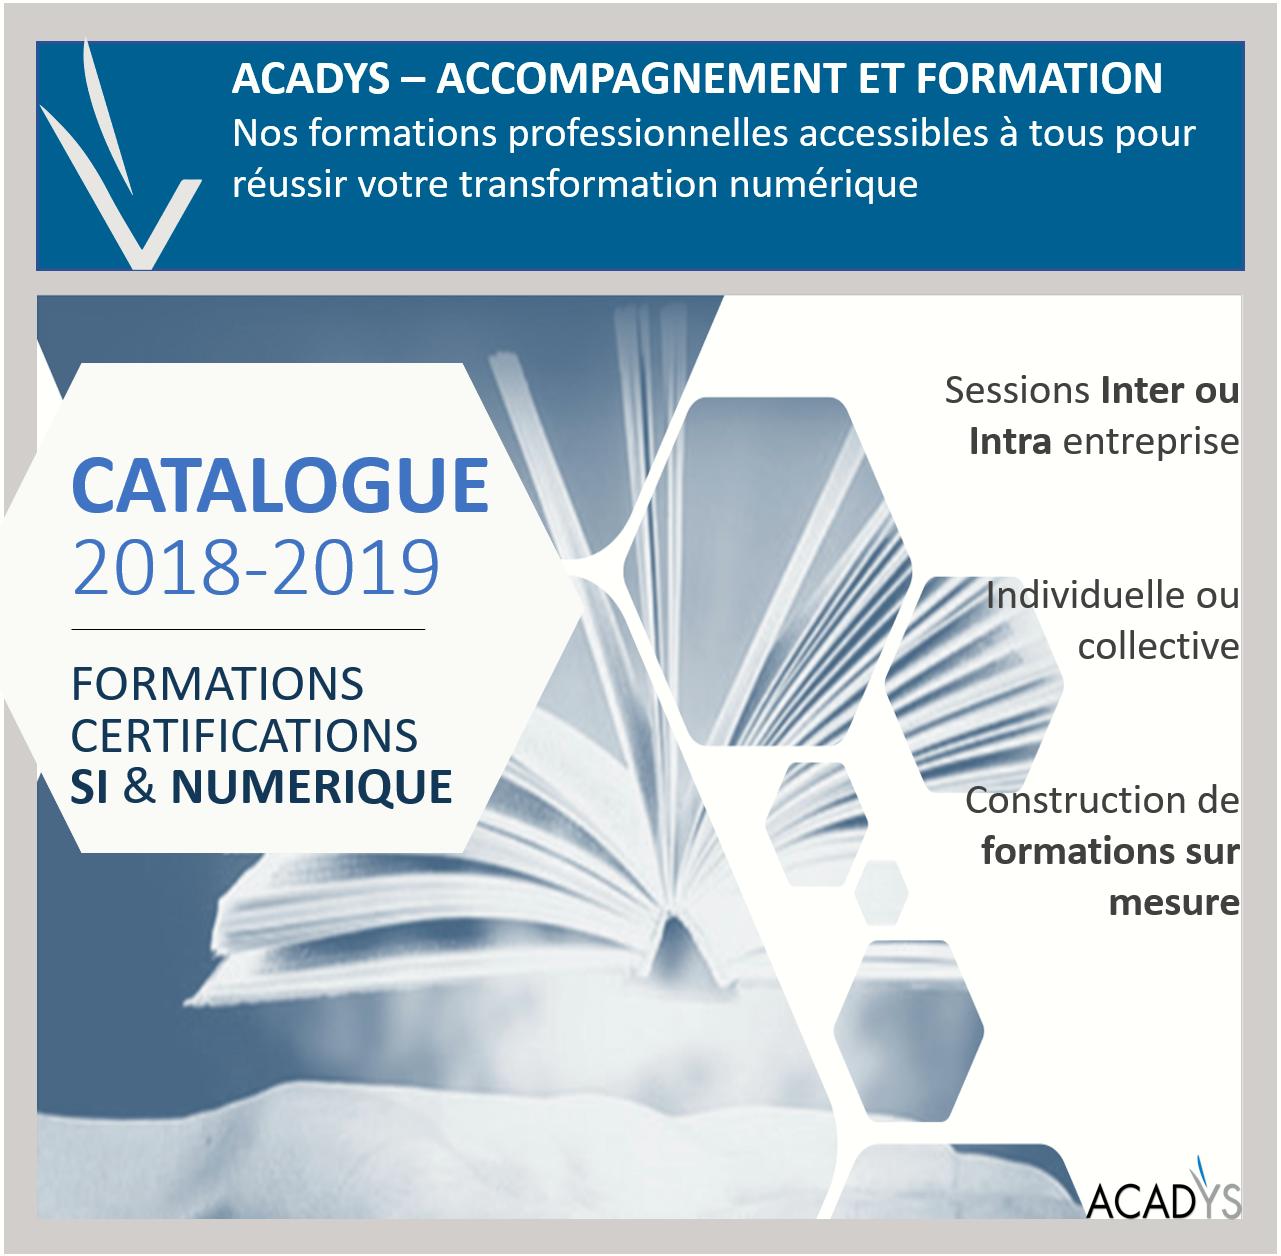 Catalogue Formation 2018-2019